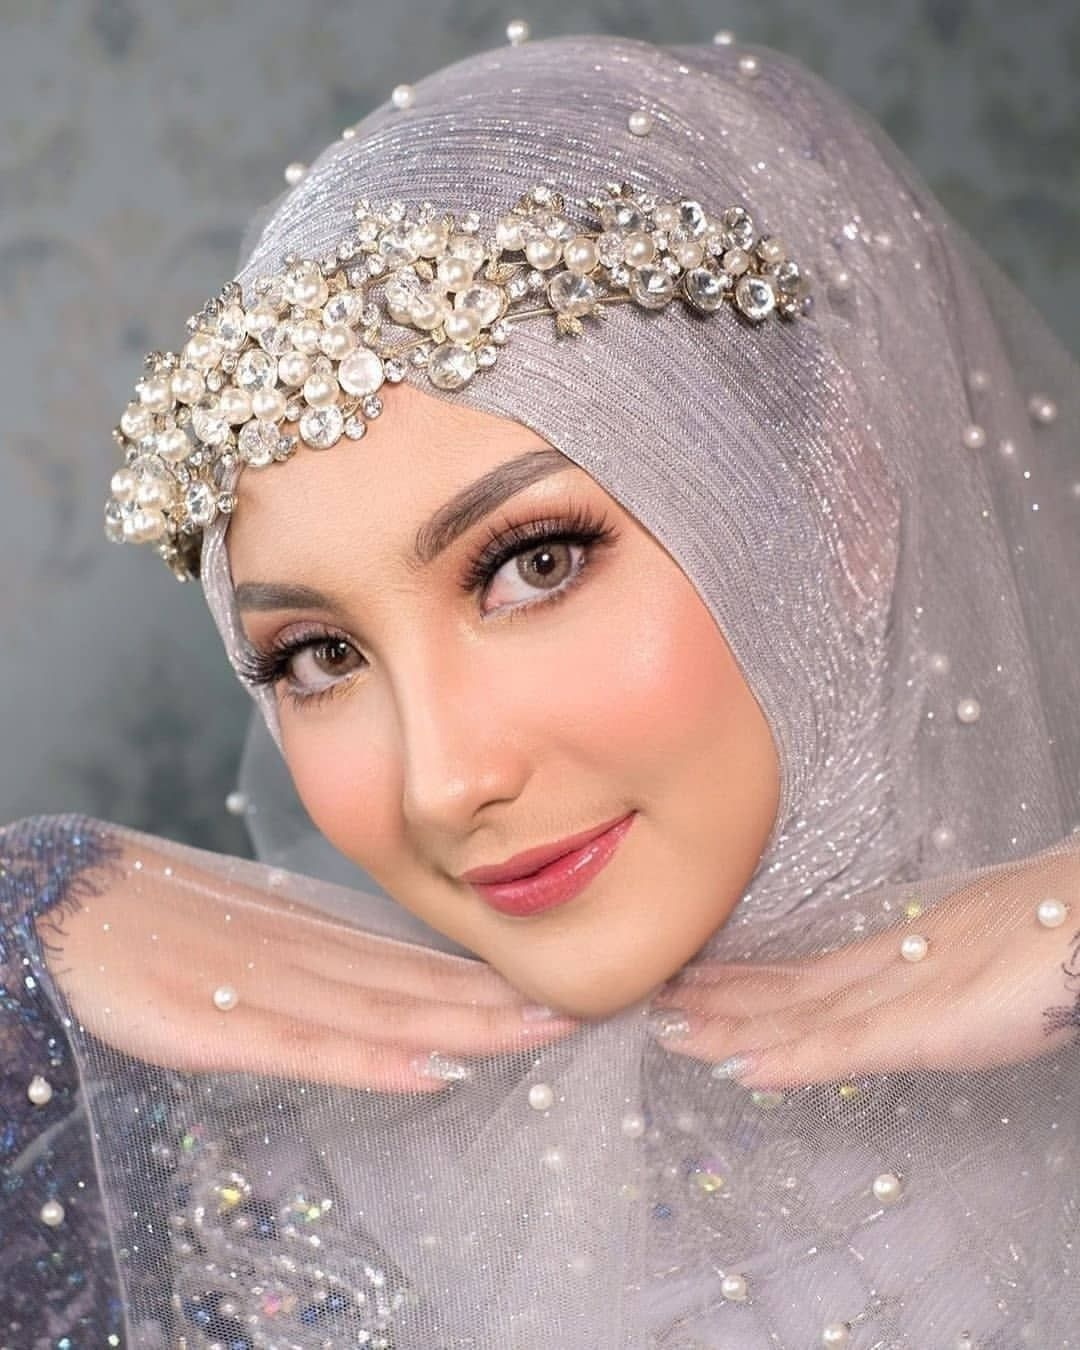 Wedding Soft Makeup Makeup Pengantin Pengantin Wanita Gaya Pengantin